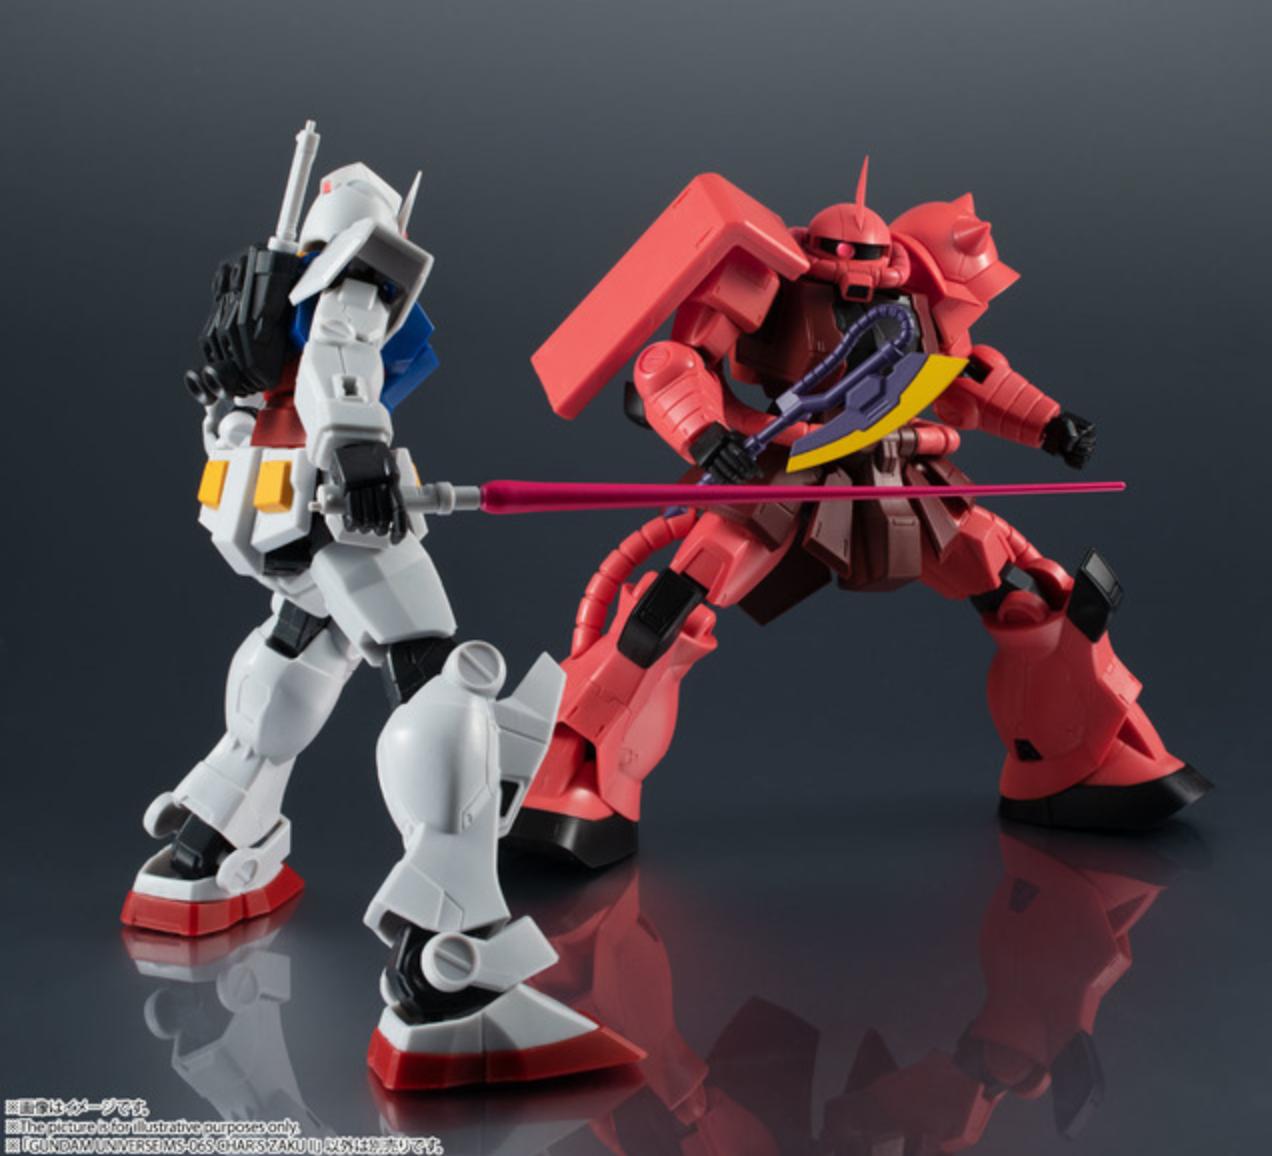 Char's Zaku II poses with a Gundam